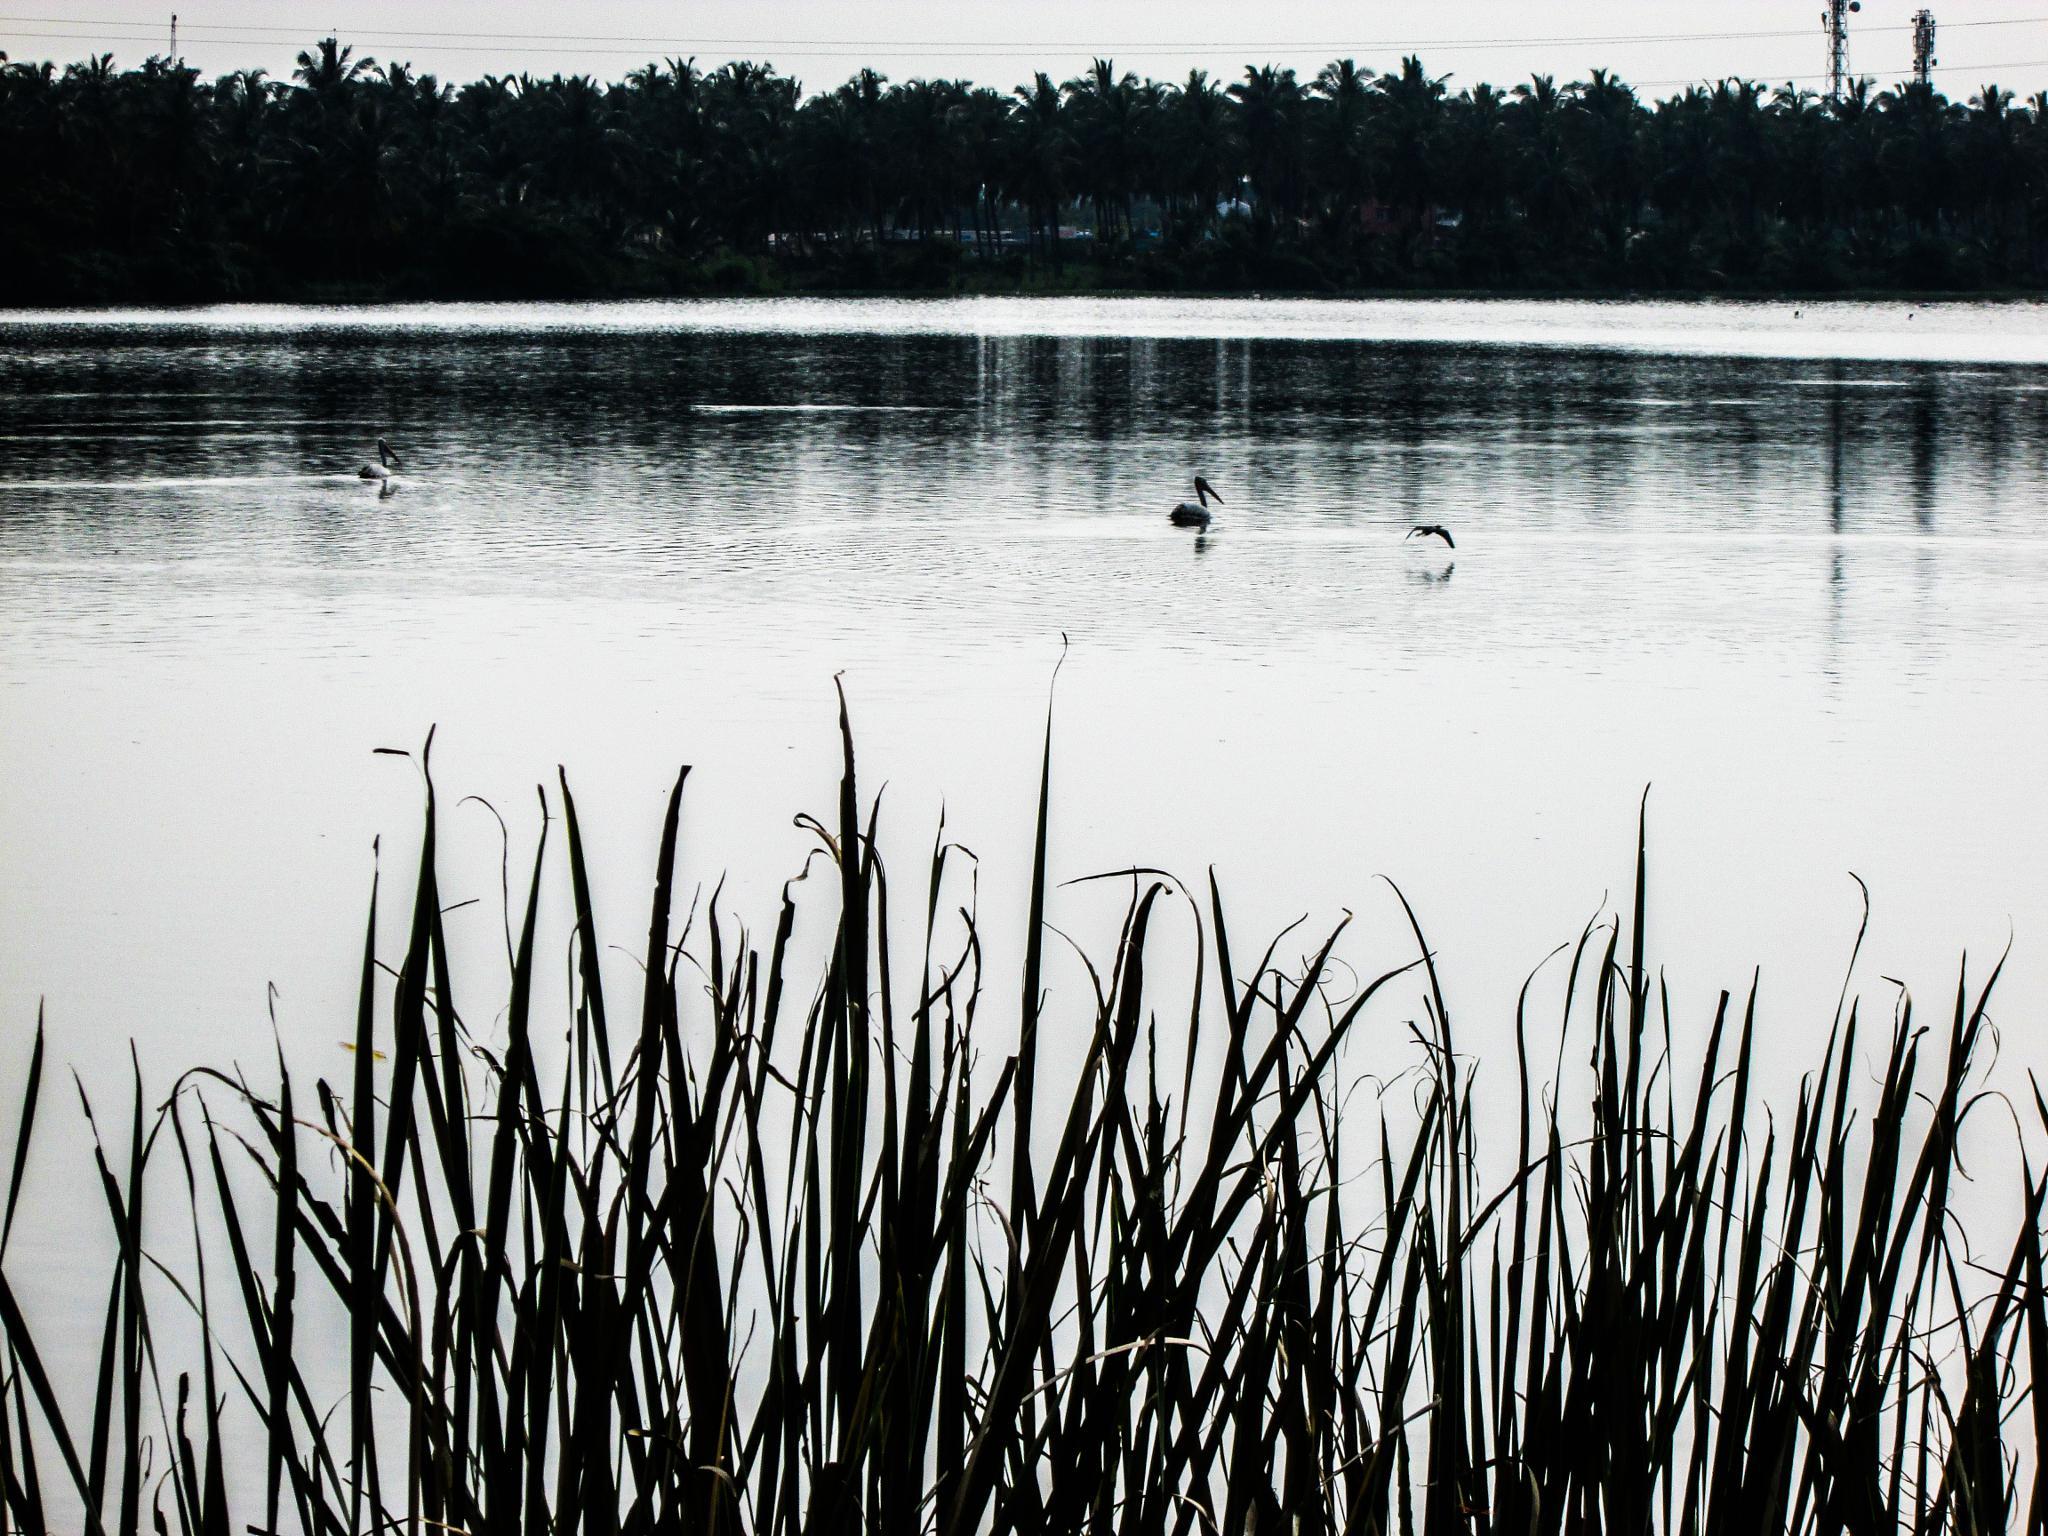 Untitled by Hari Prasath